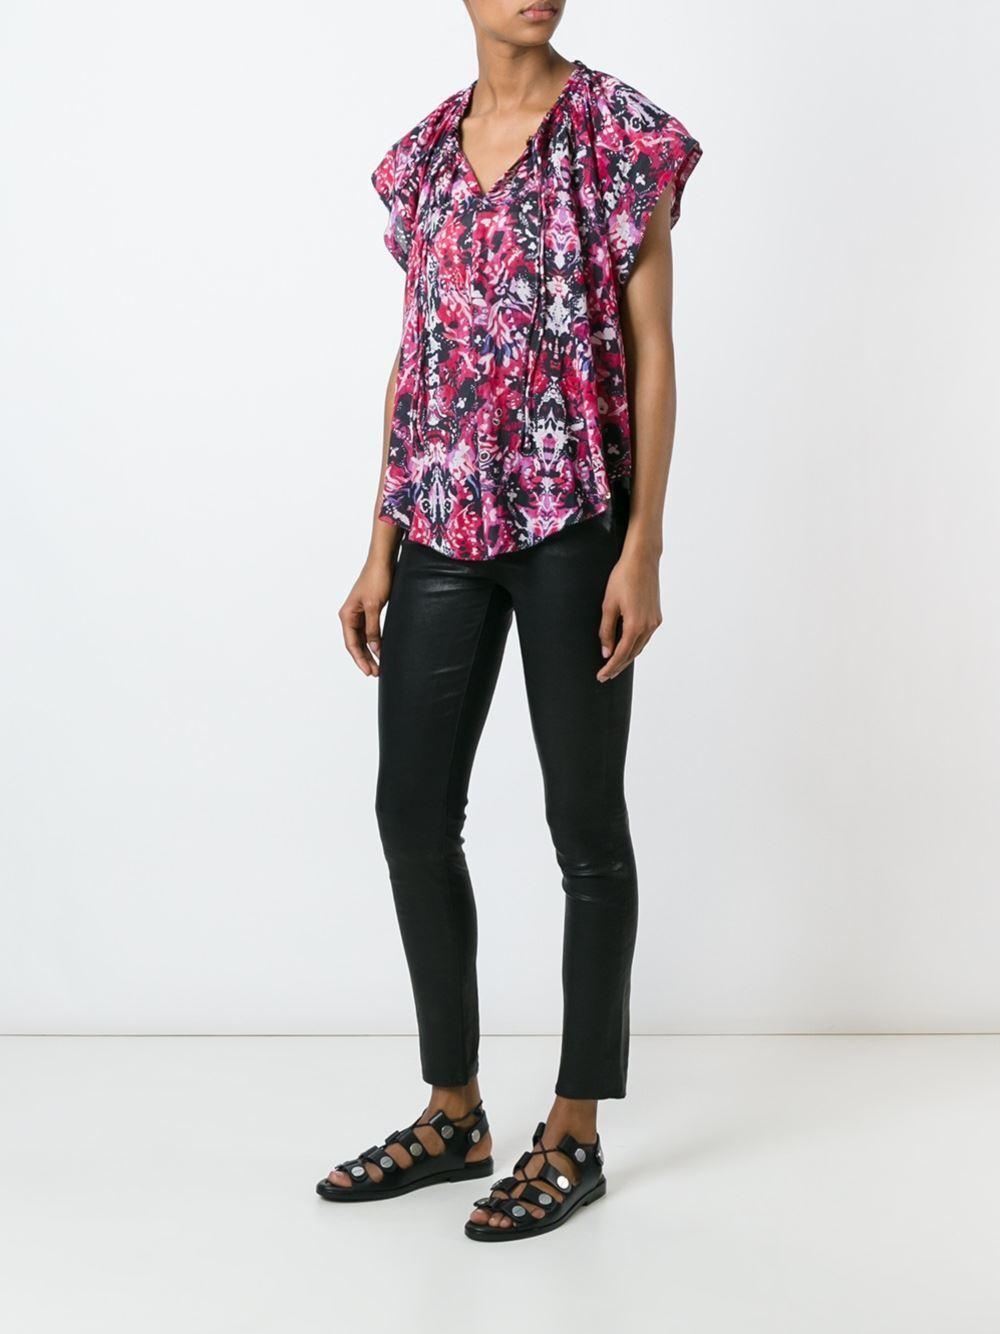 IRO Iseline Abstract Print Cotton Caftan Short Sleeve Rosa Peasant Shirt Top- 4